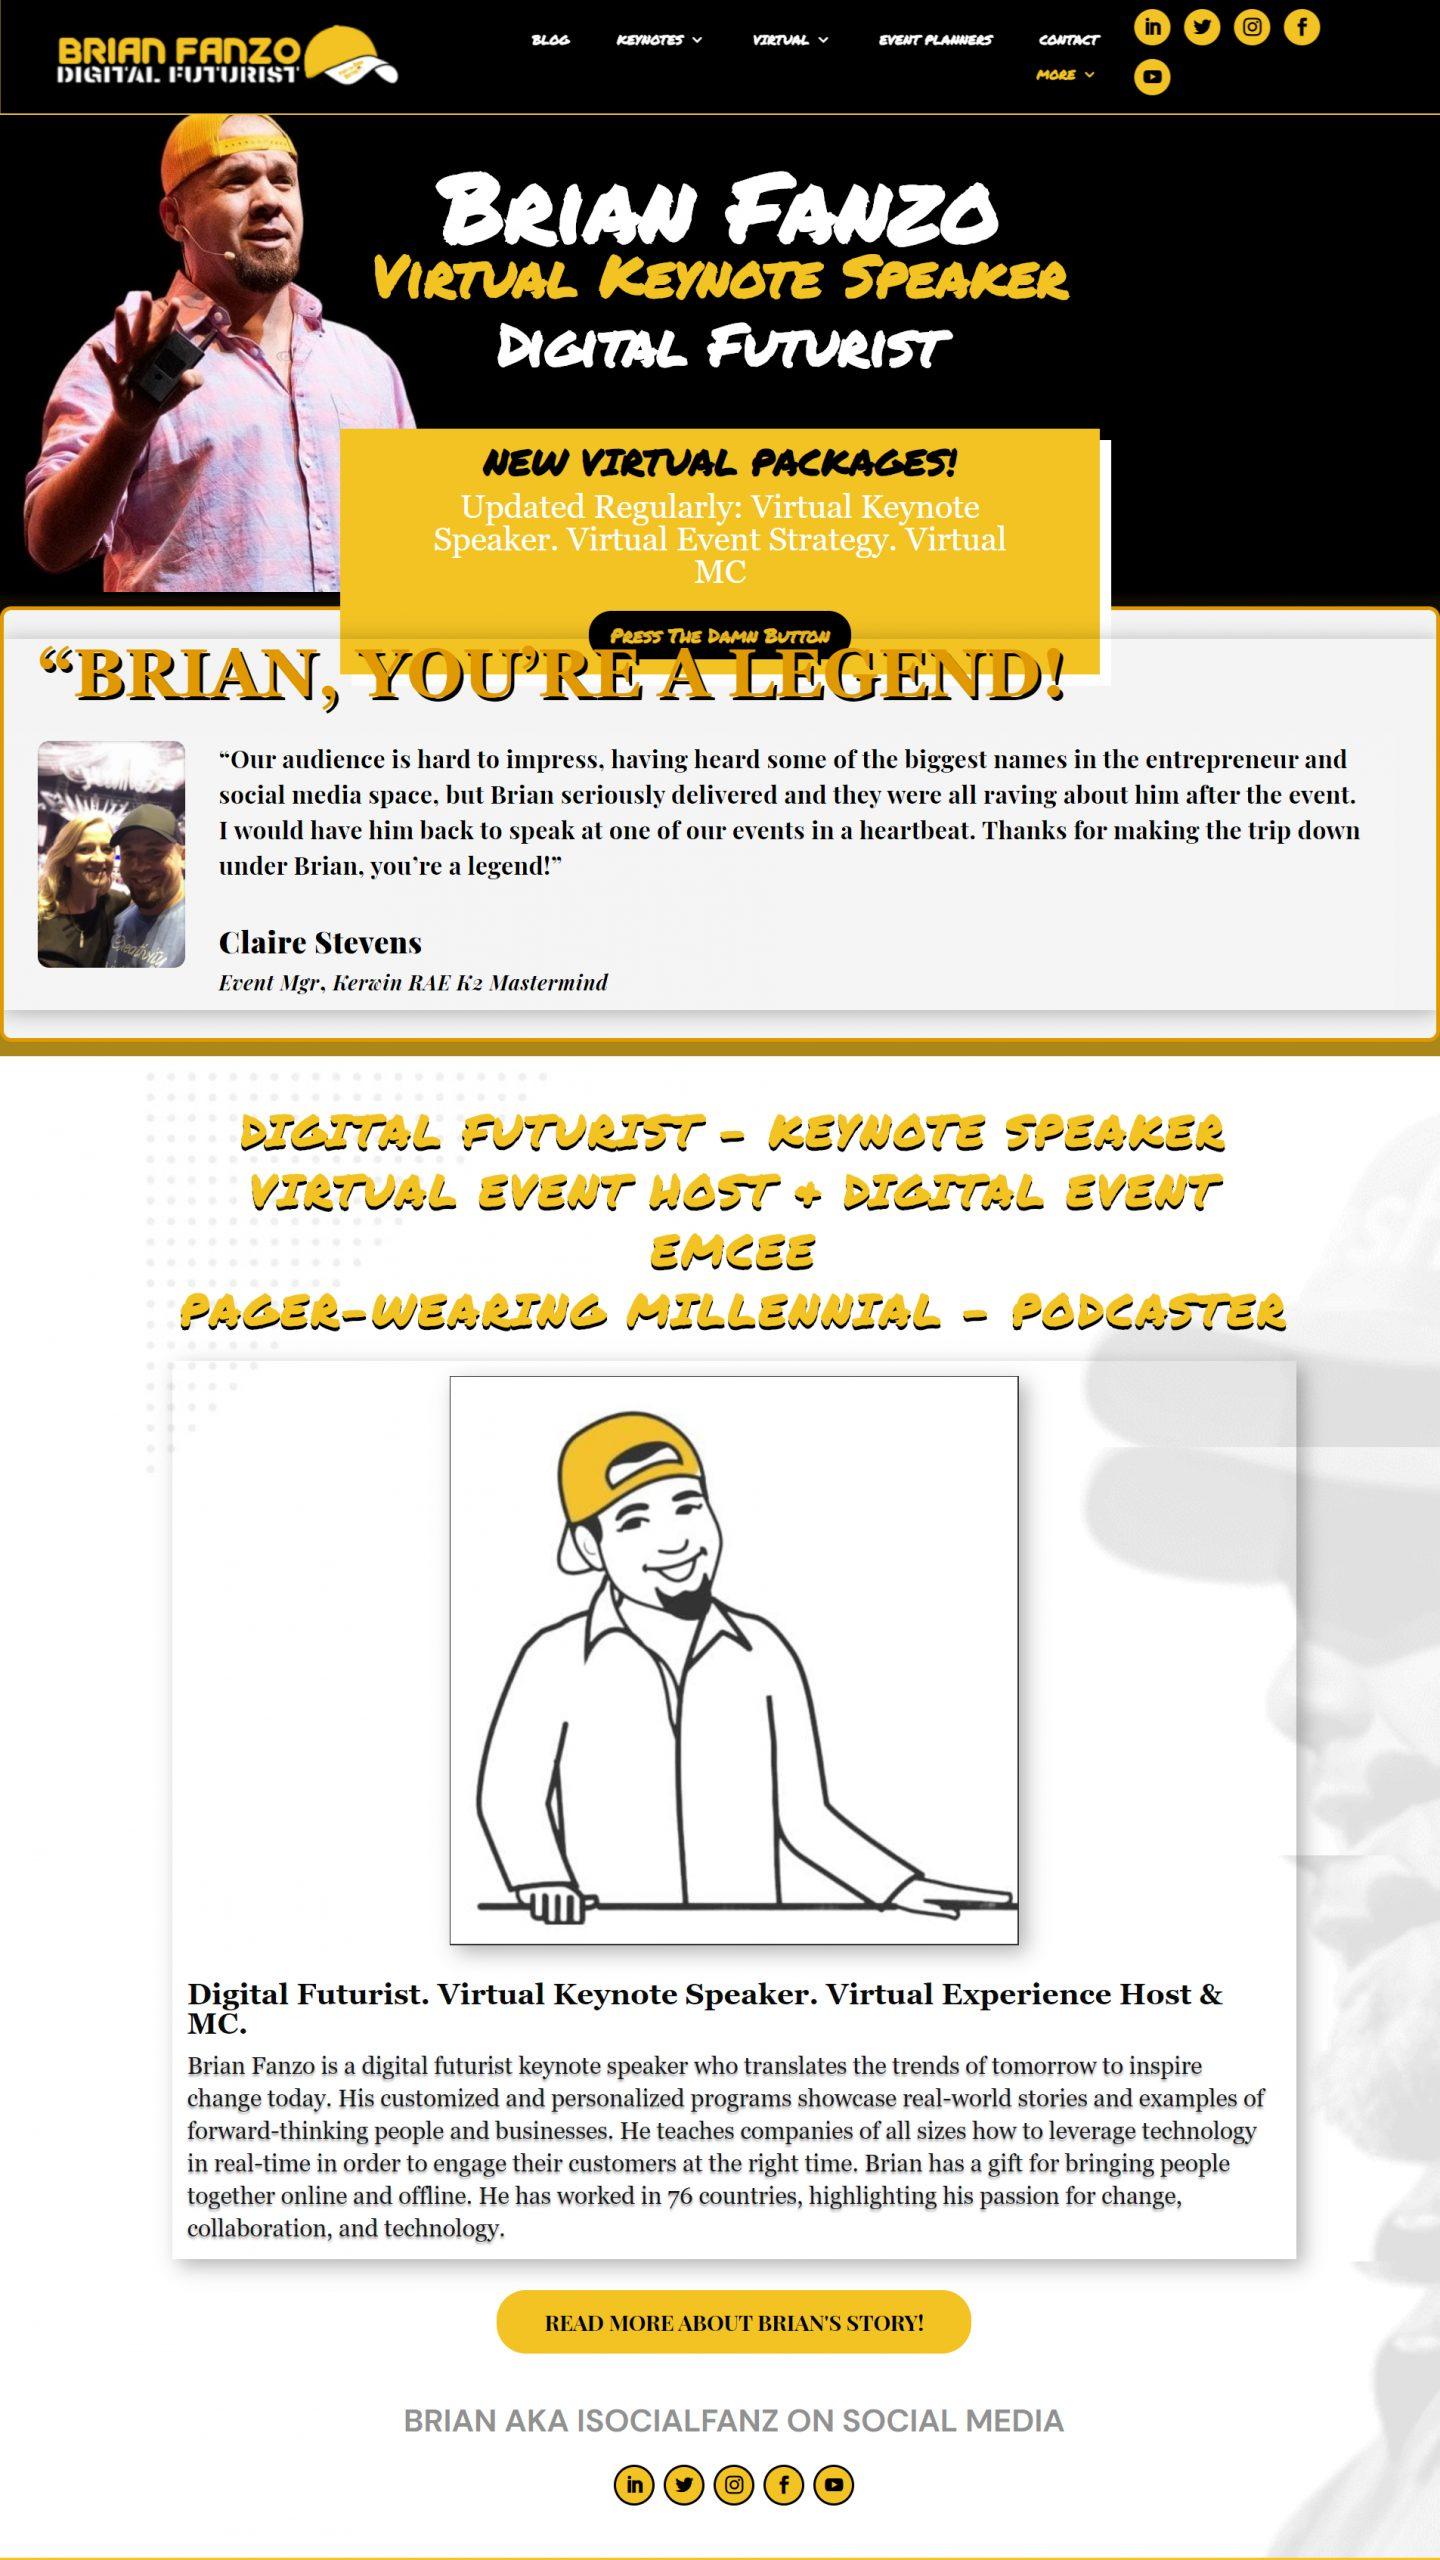 Screenshot of Brian Fanzo's website